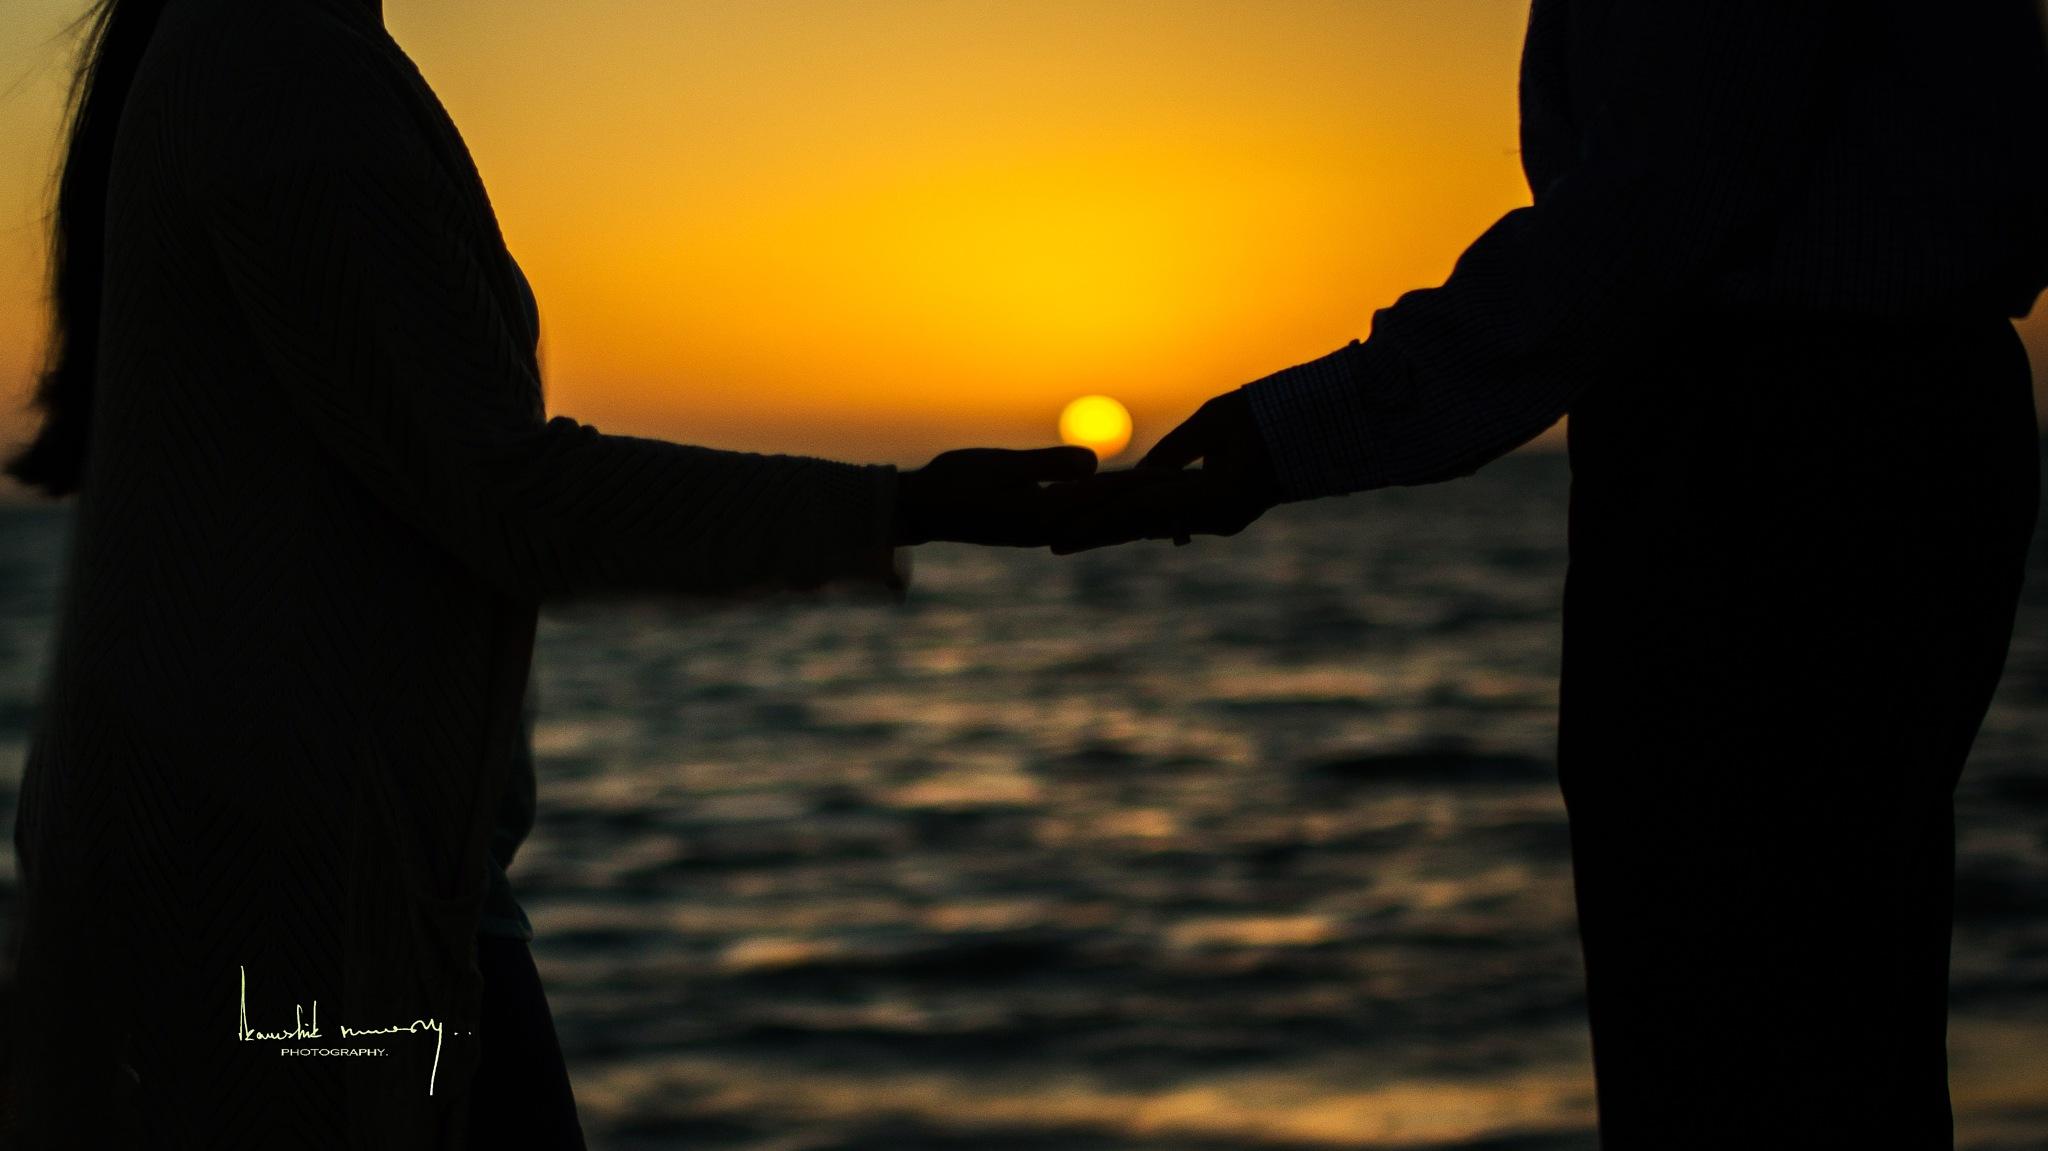 Hold My hand by Kaushik Nandy